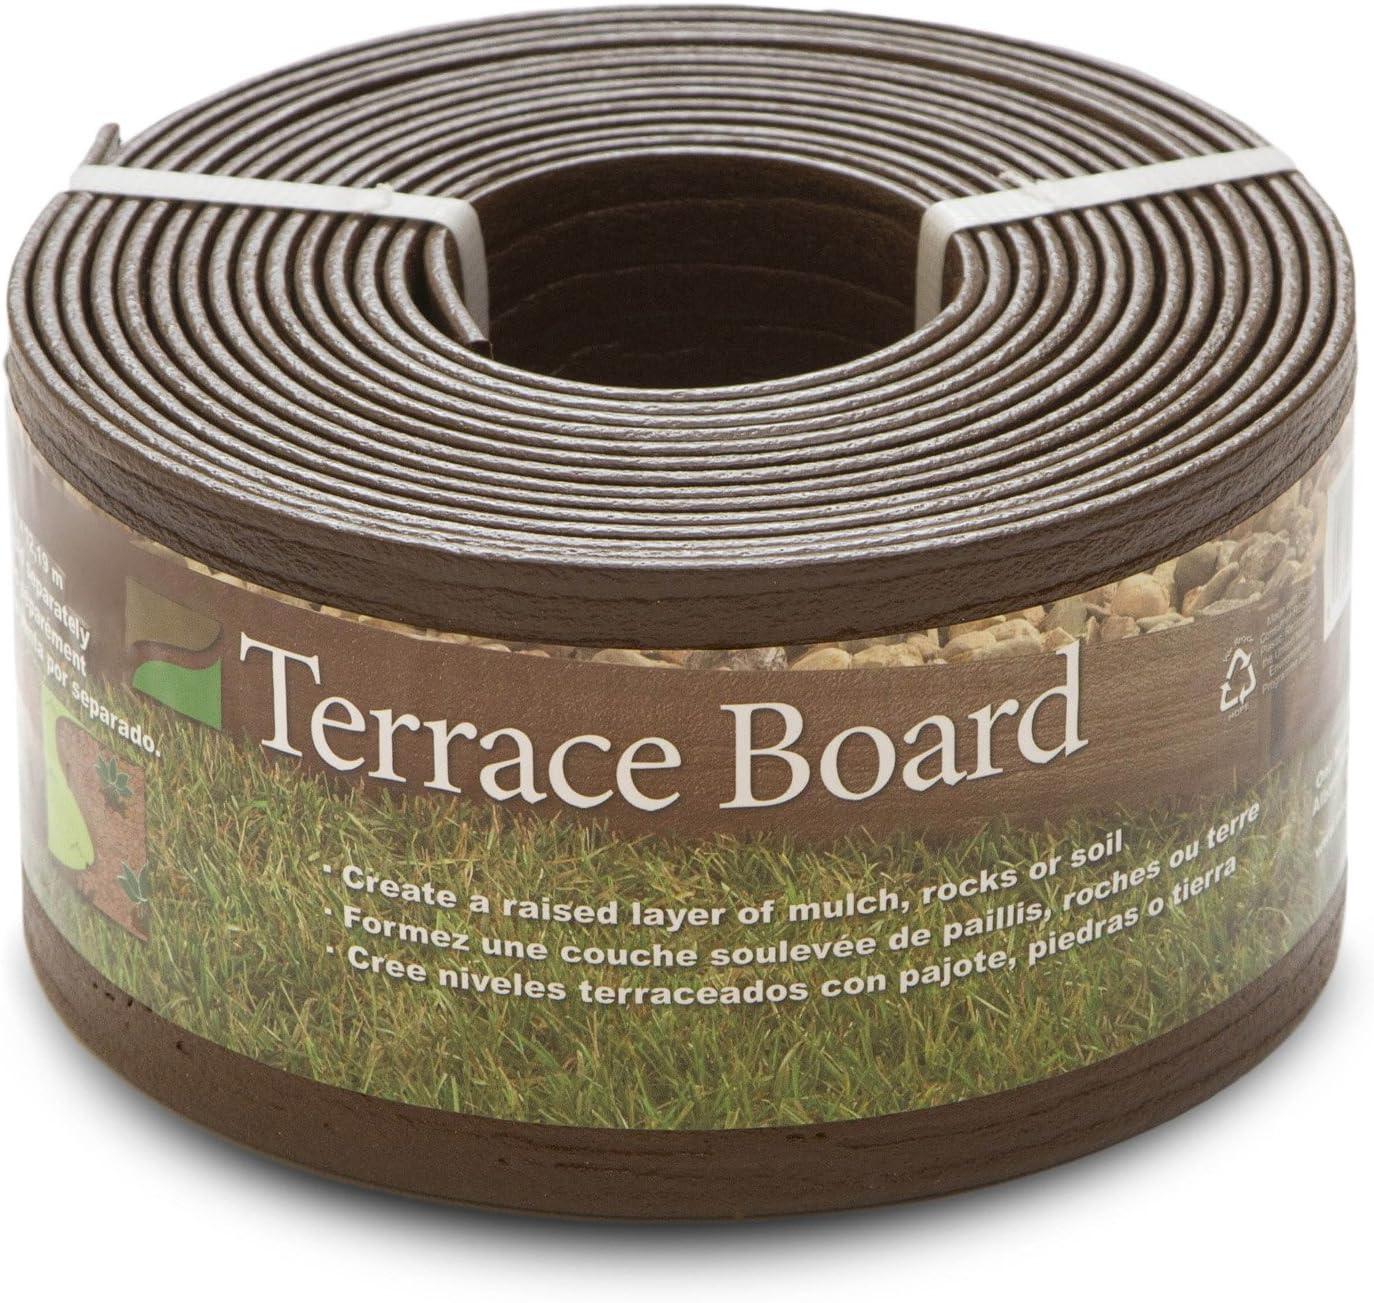 Master Mark Pl Prod 94320 Terrace Board Landscape EDG Ing 4 X 20 Brown